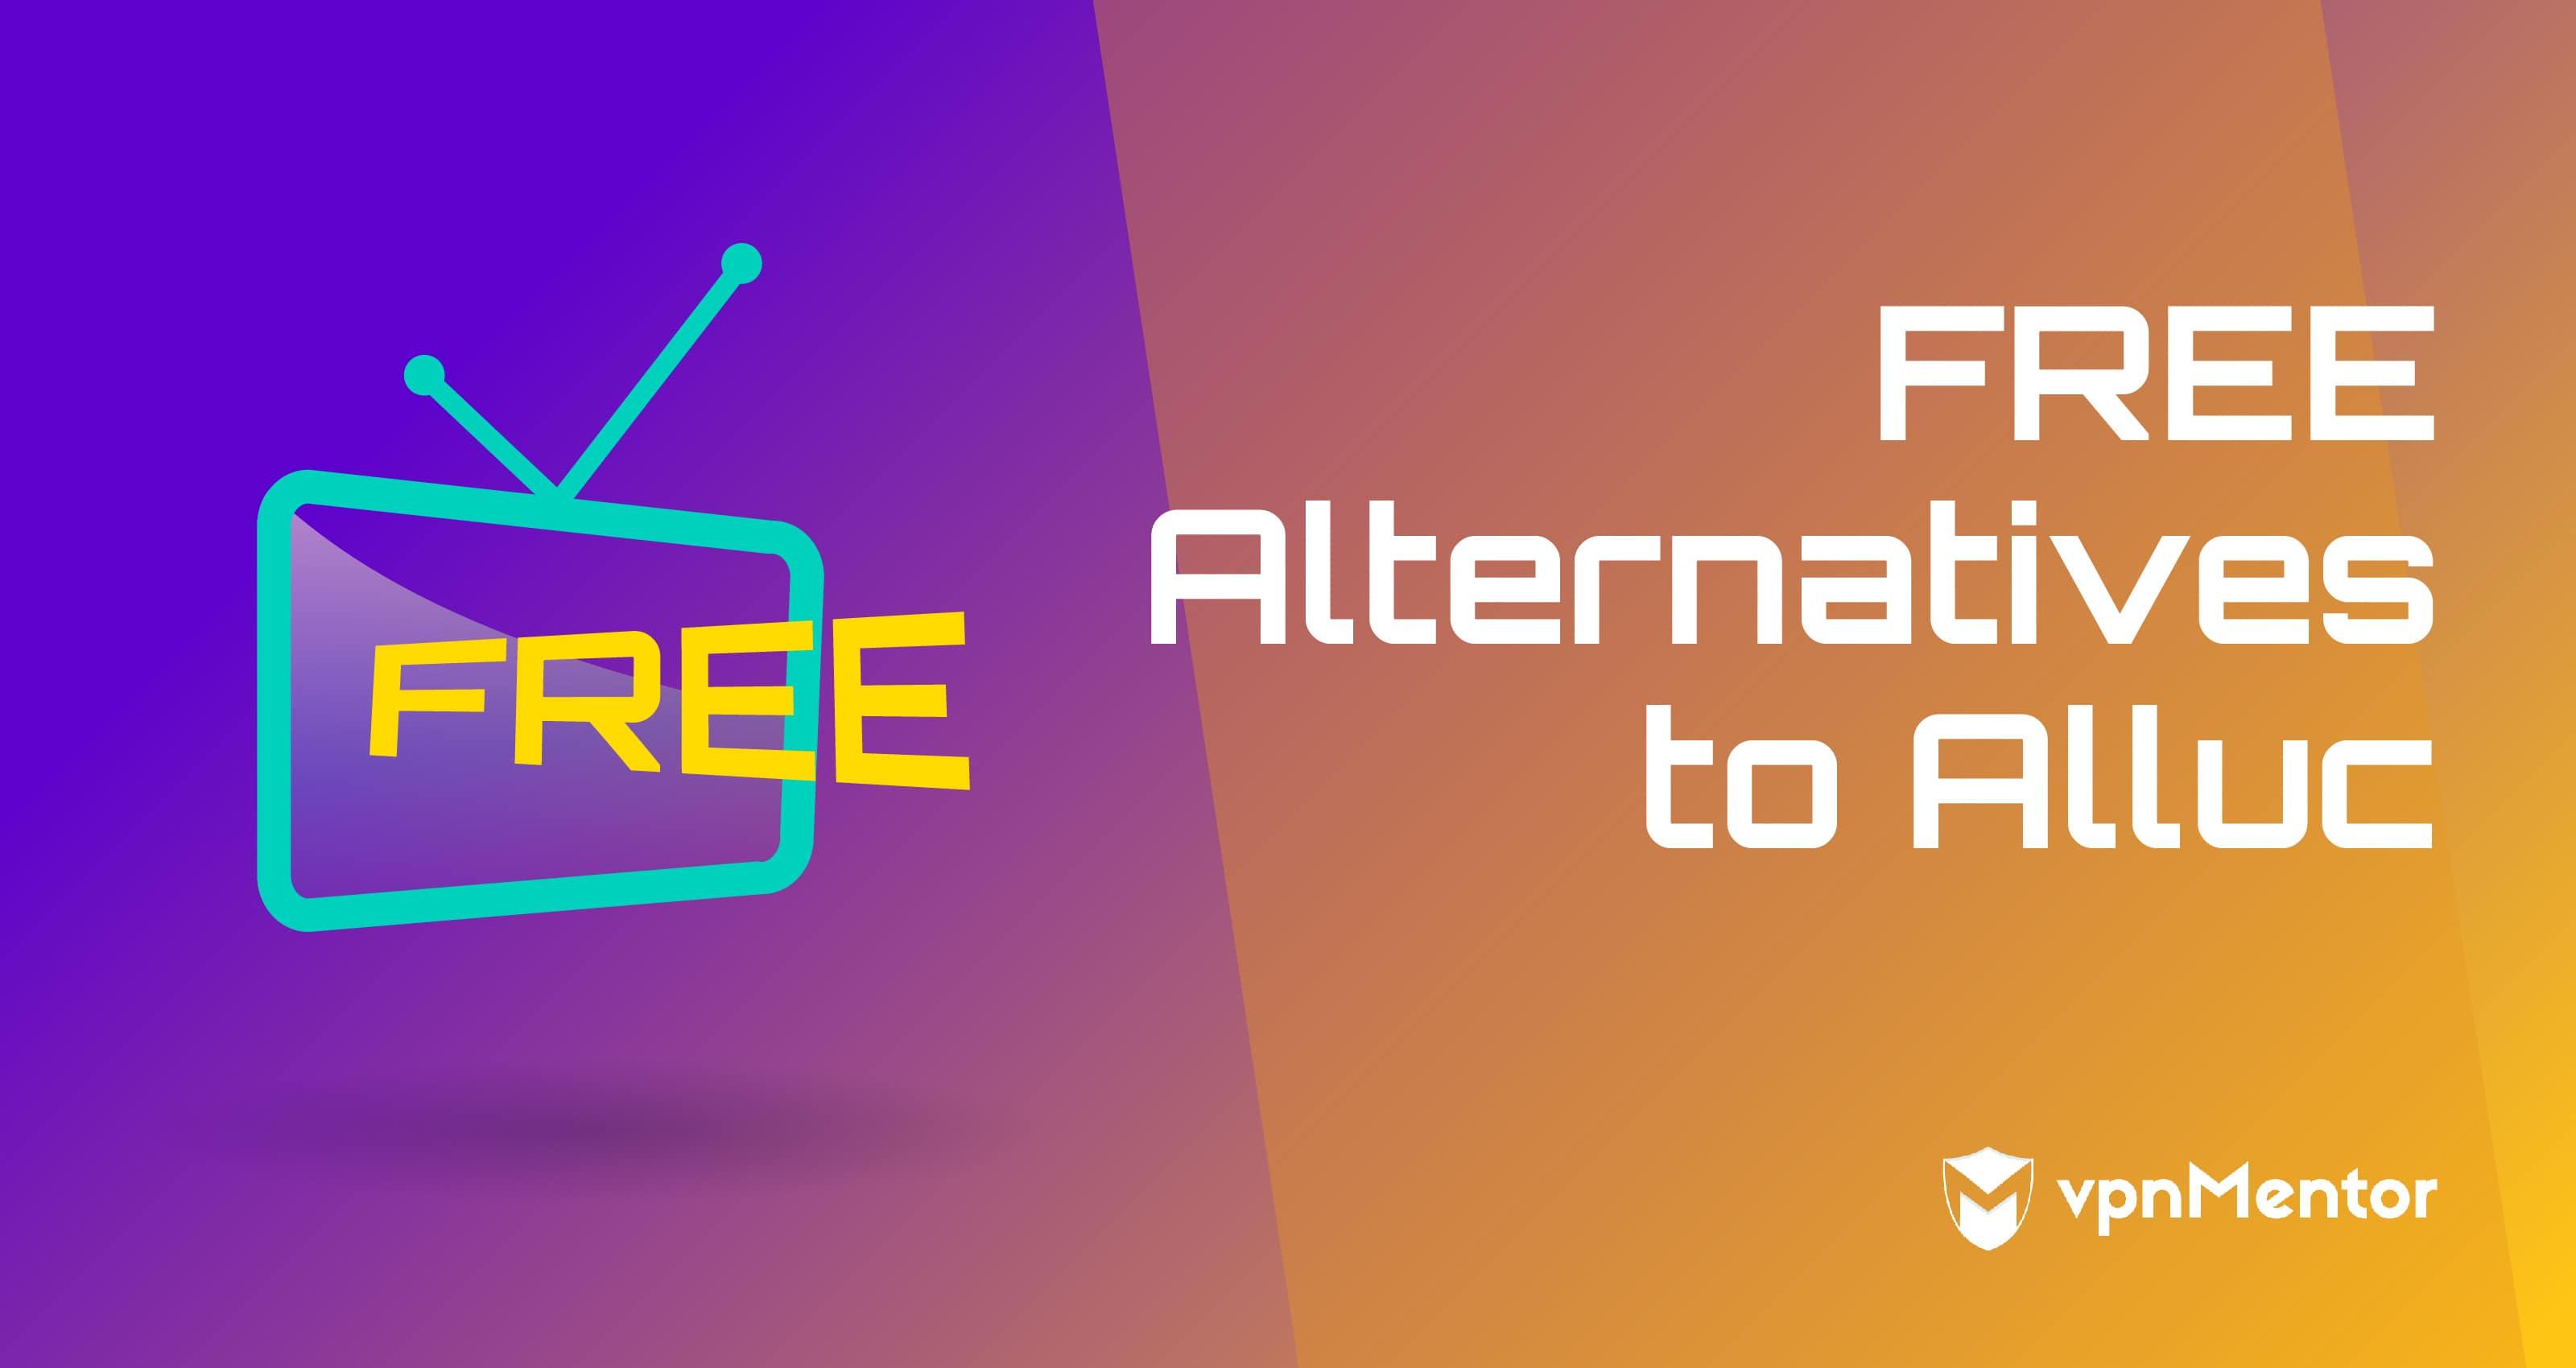 Free Alternatives to Alluc